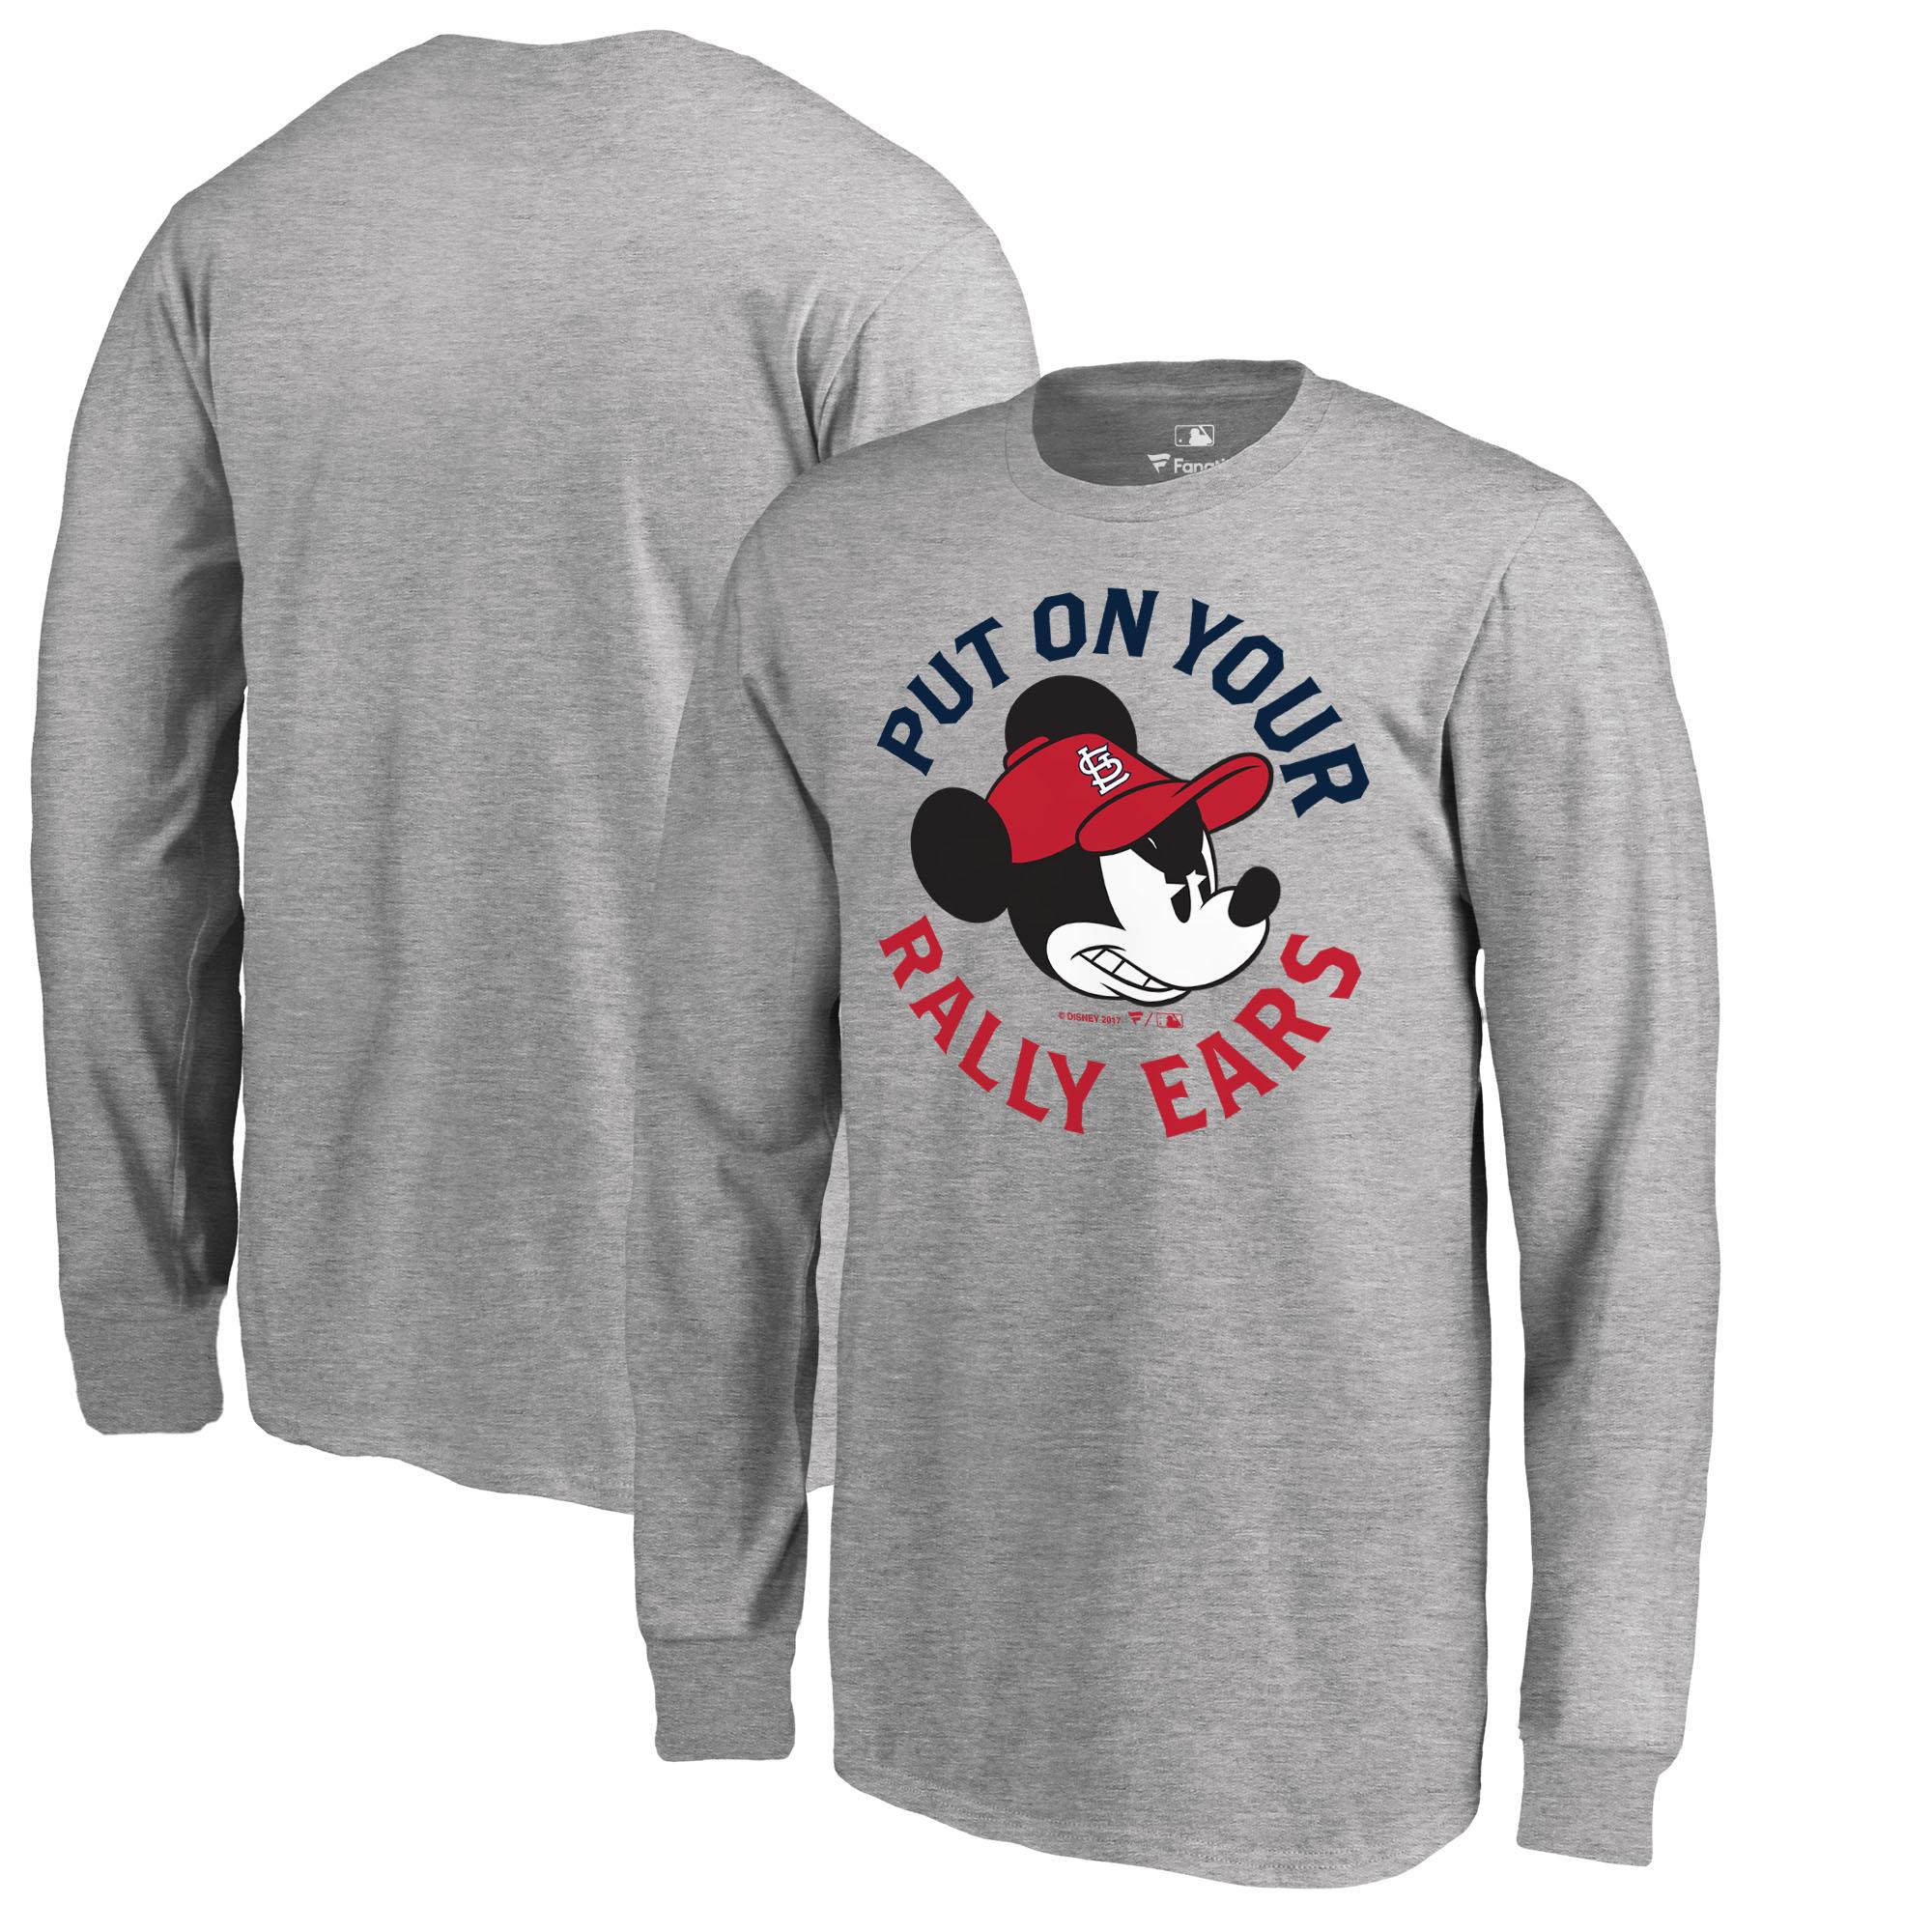 St. Louis Cardinals Fanatics Branded Youth Disney Rally Ears Long Sleeve T-Shirt - Heathered Gray